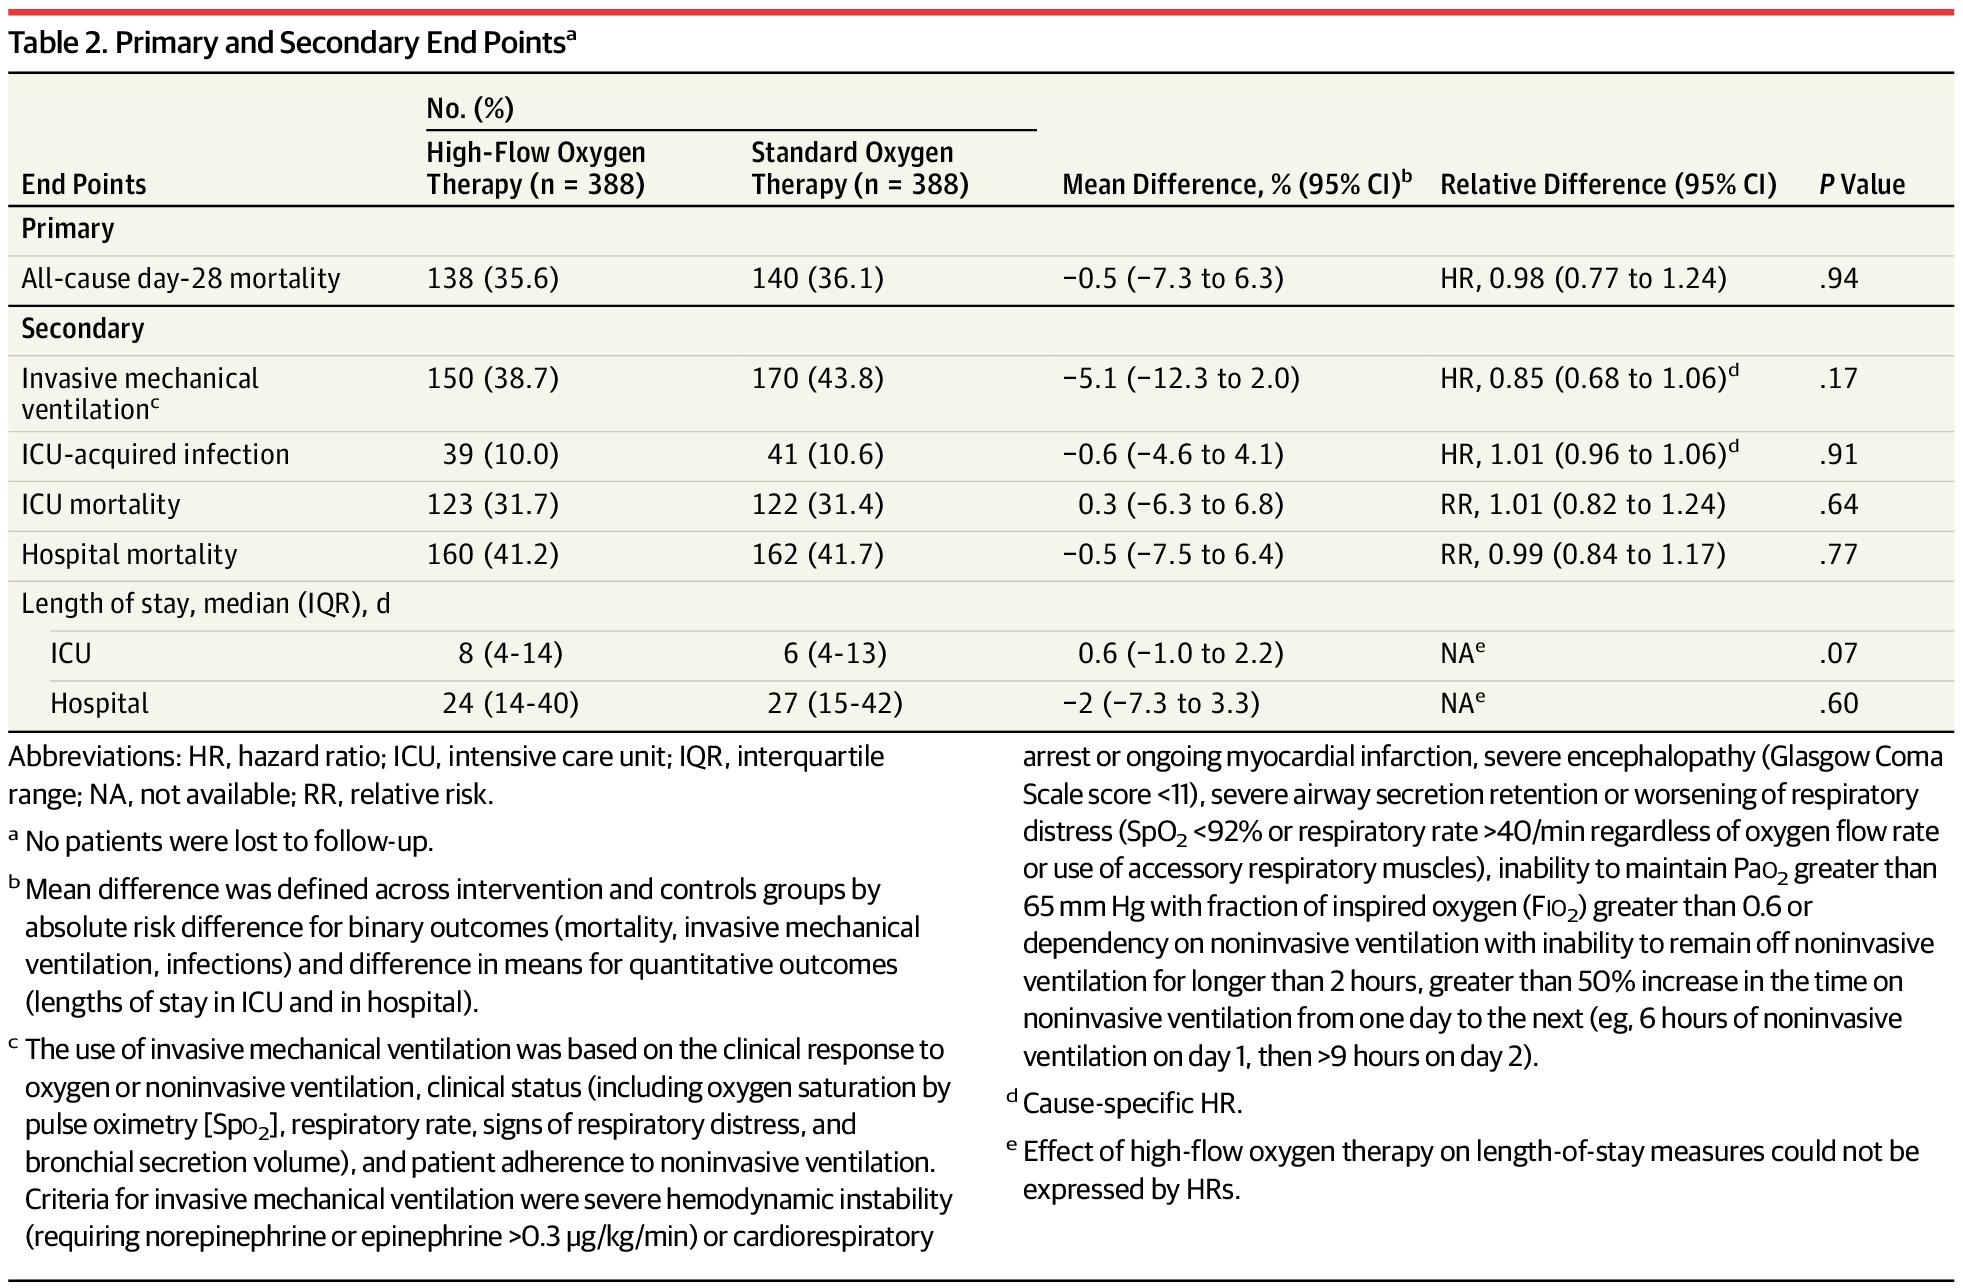 [JAMA在线发表]:高流量鼻导管氧疗不能降低合并急性呼吸功能衰竭的免疫功能抑制患者28天病死率